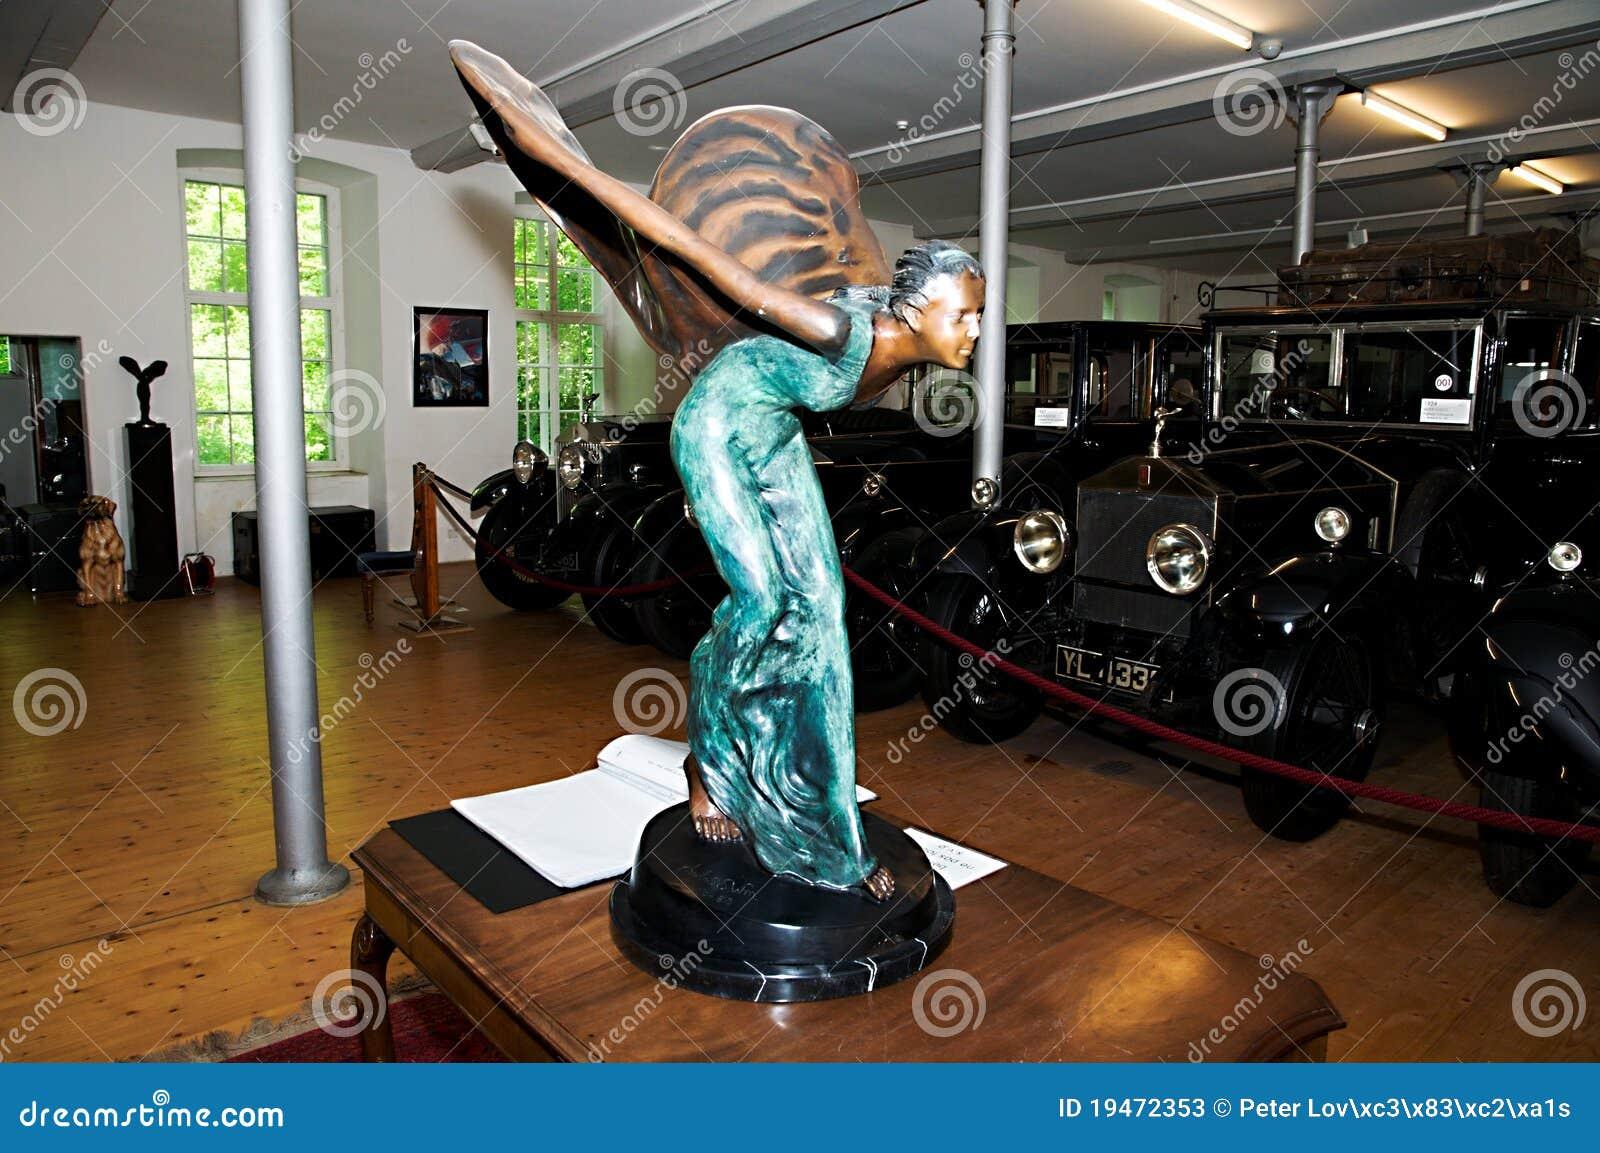 rolls royce museum  dornbirn  rolls royce car logo editorial stock photo   image 19472353